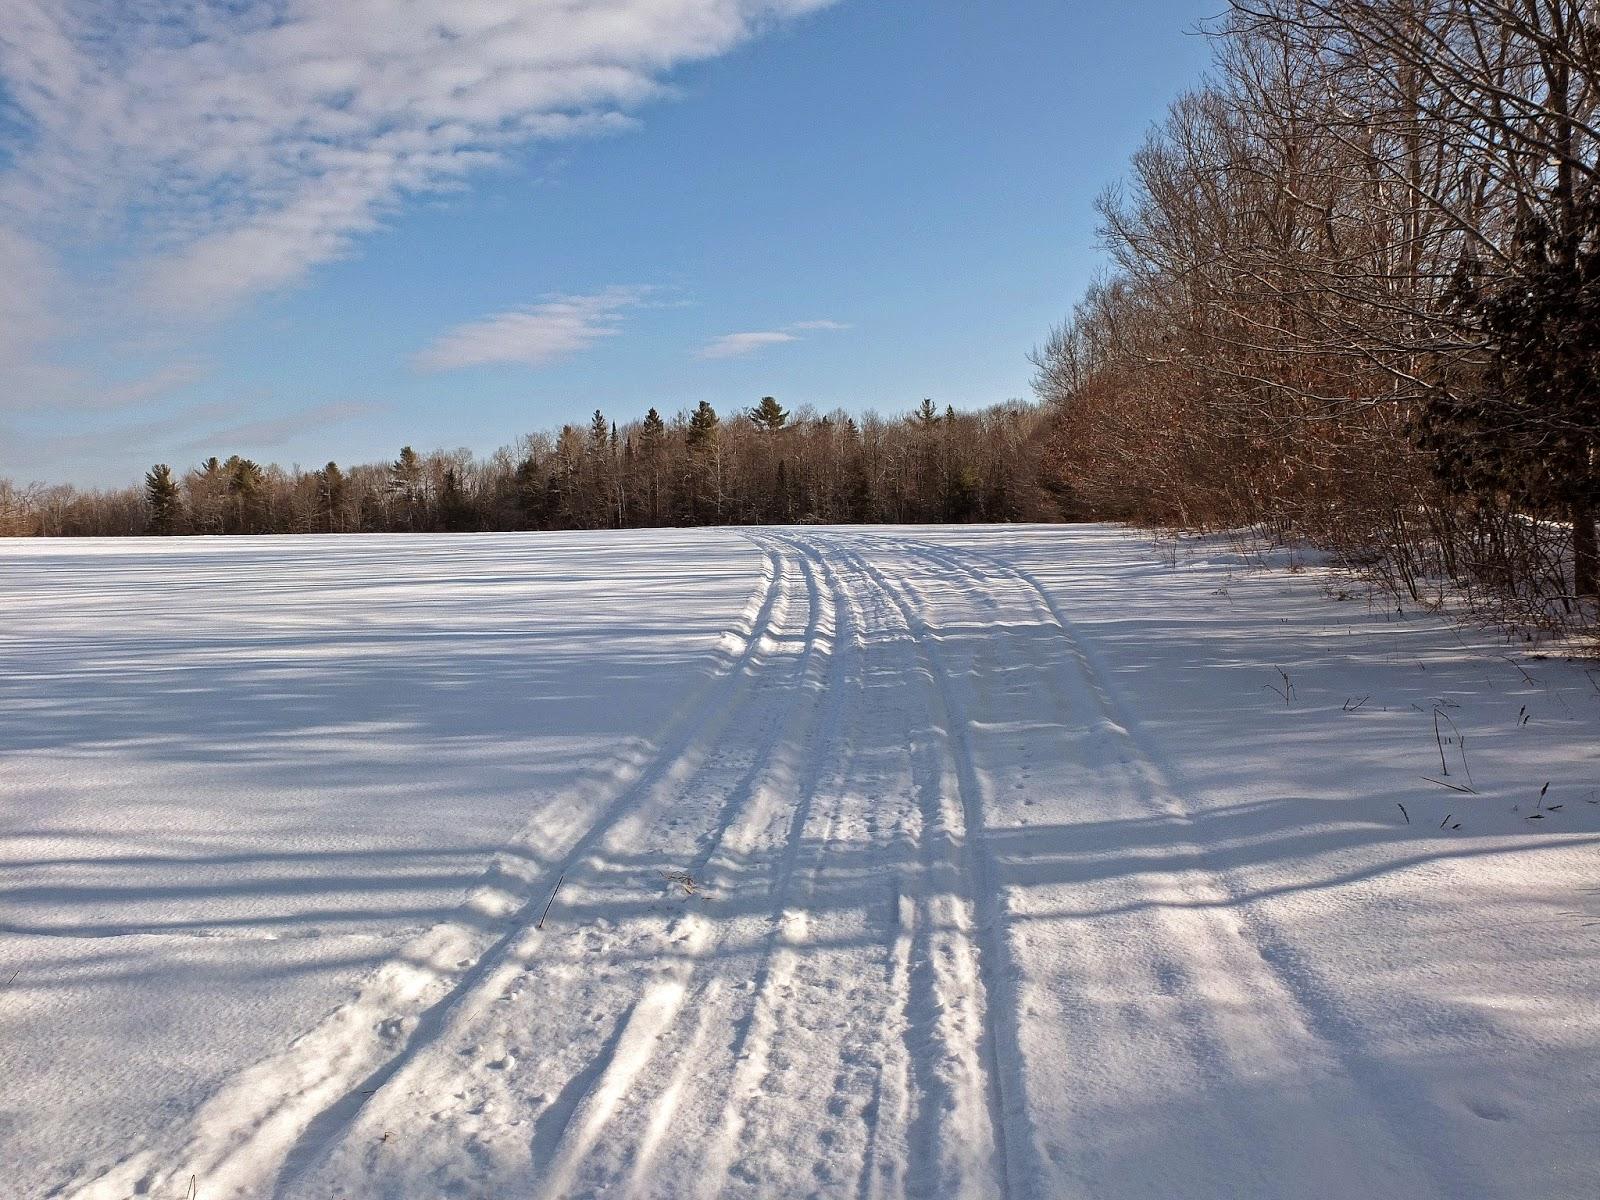 Hiking in Maine with Kelley: 1/16/15 Glenburn Snowmobile Trail